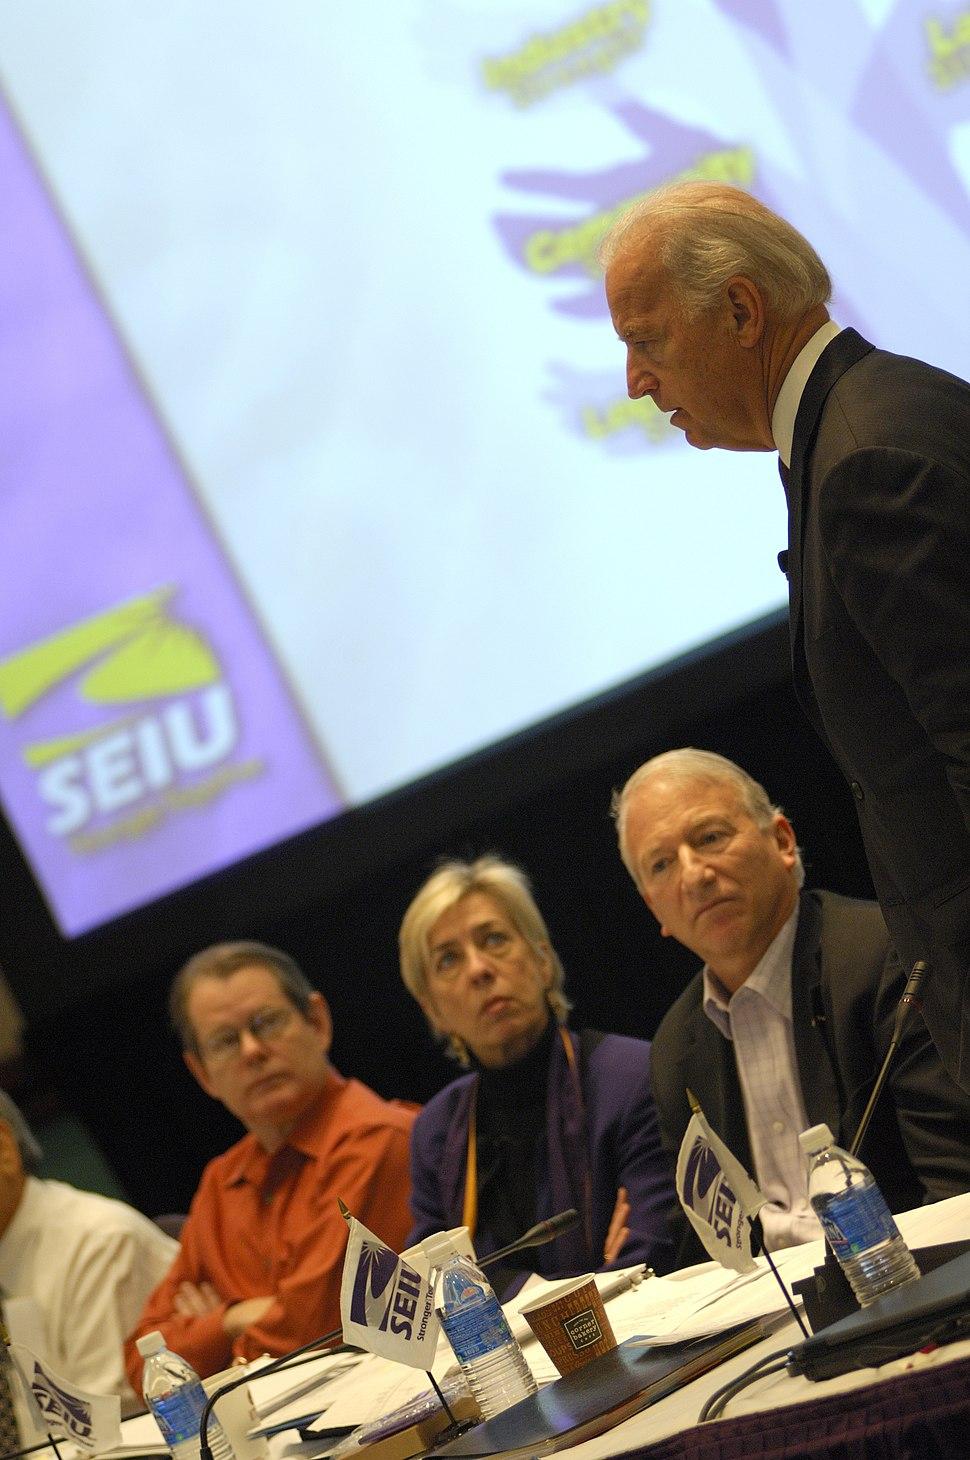 The SEIU family listens to Sen. Joe Biden